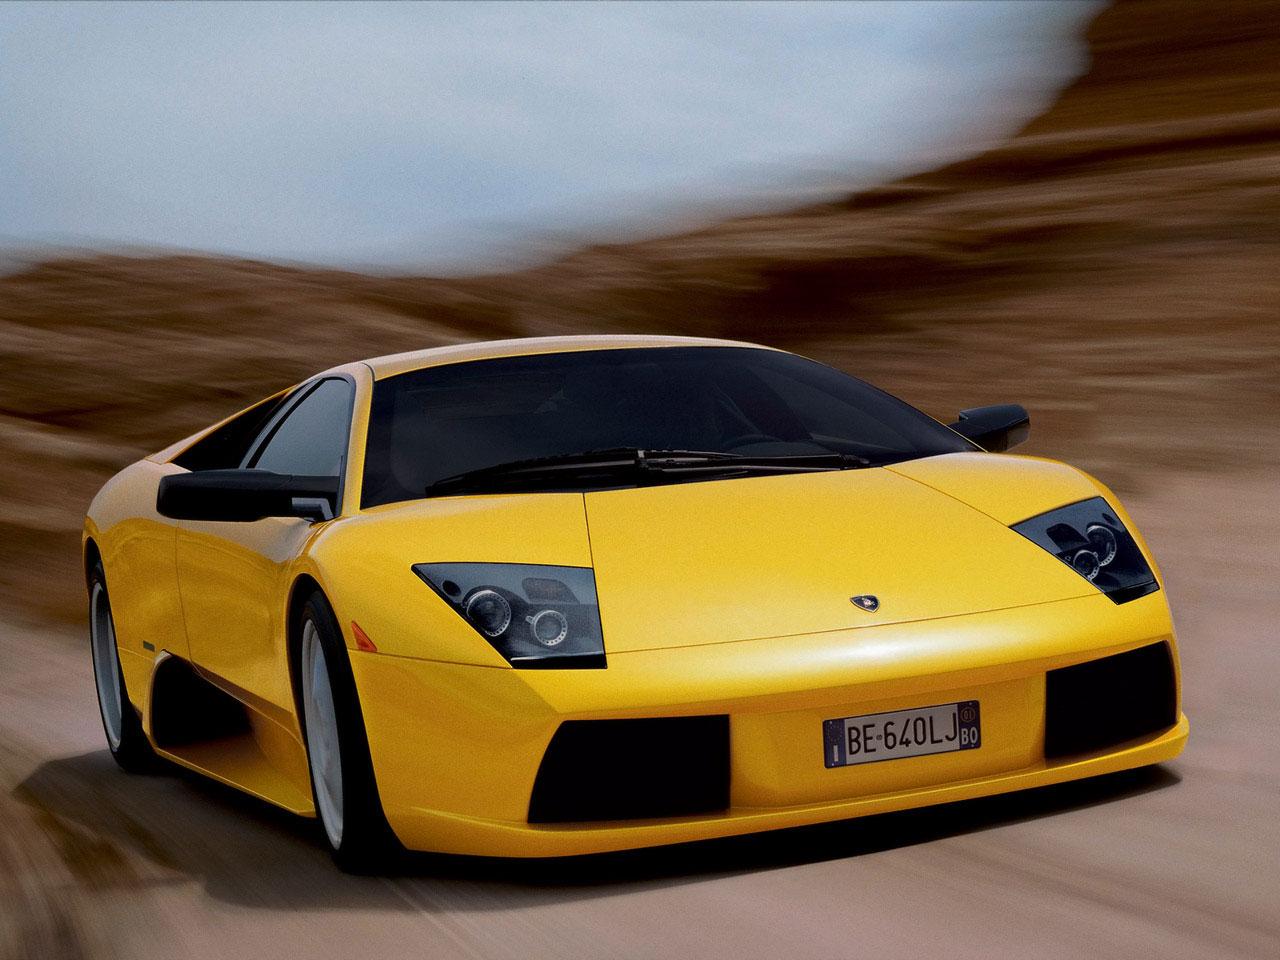 2006 Lamborghini Murcielago Picture